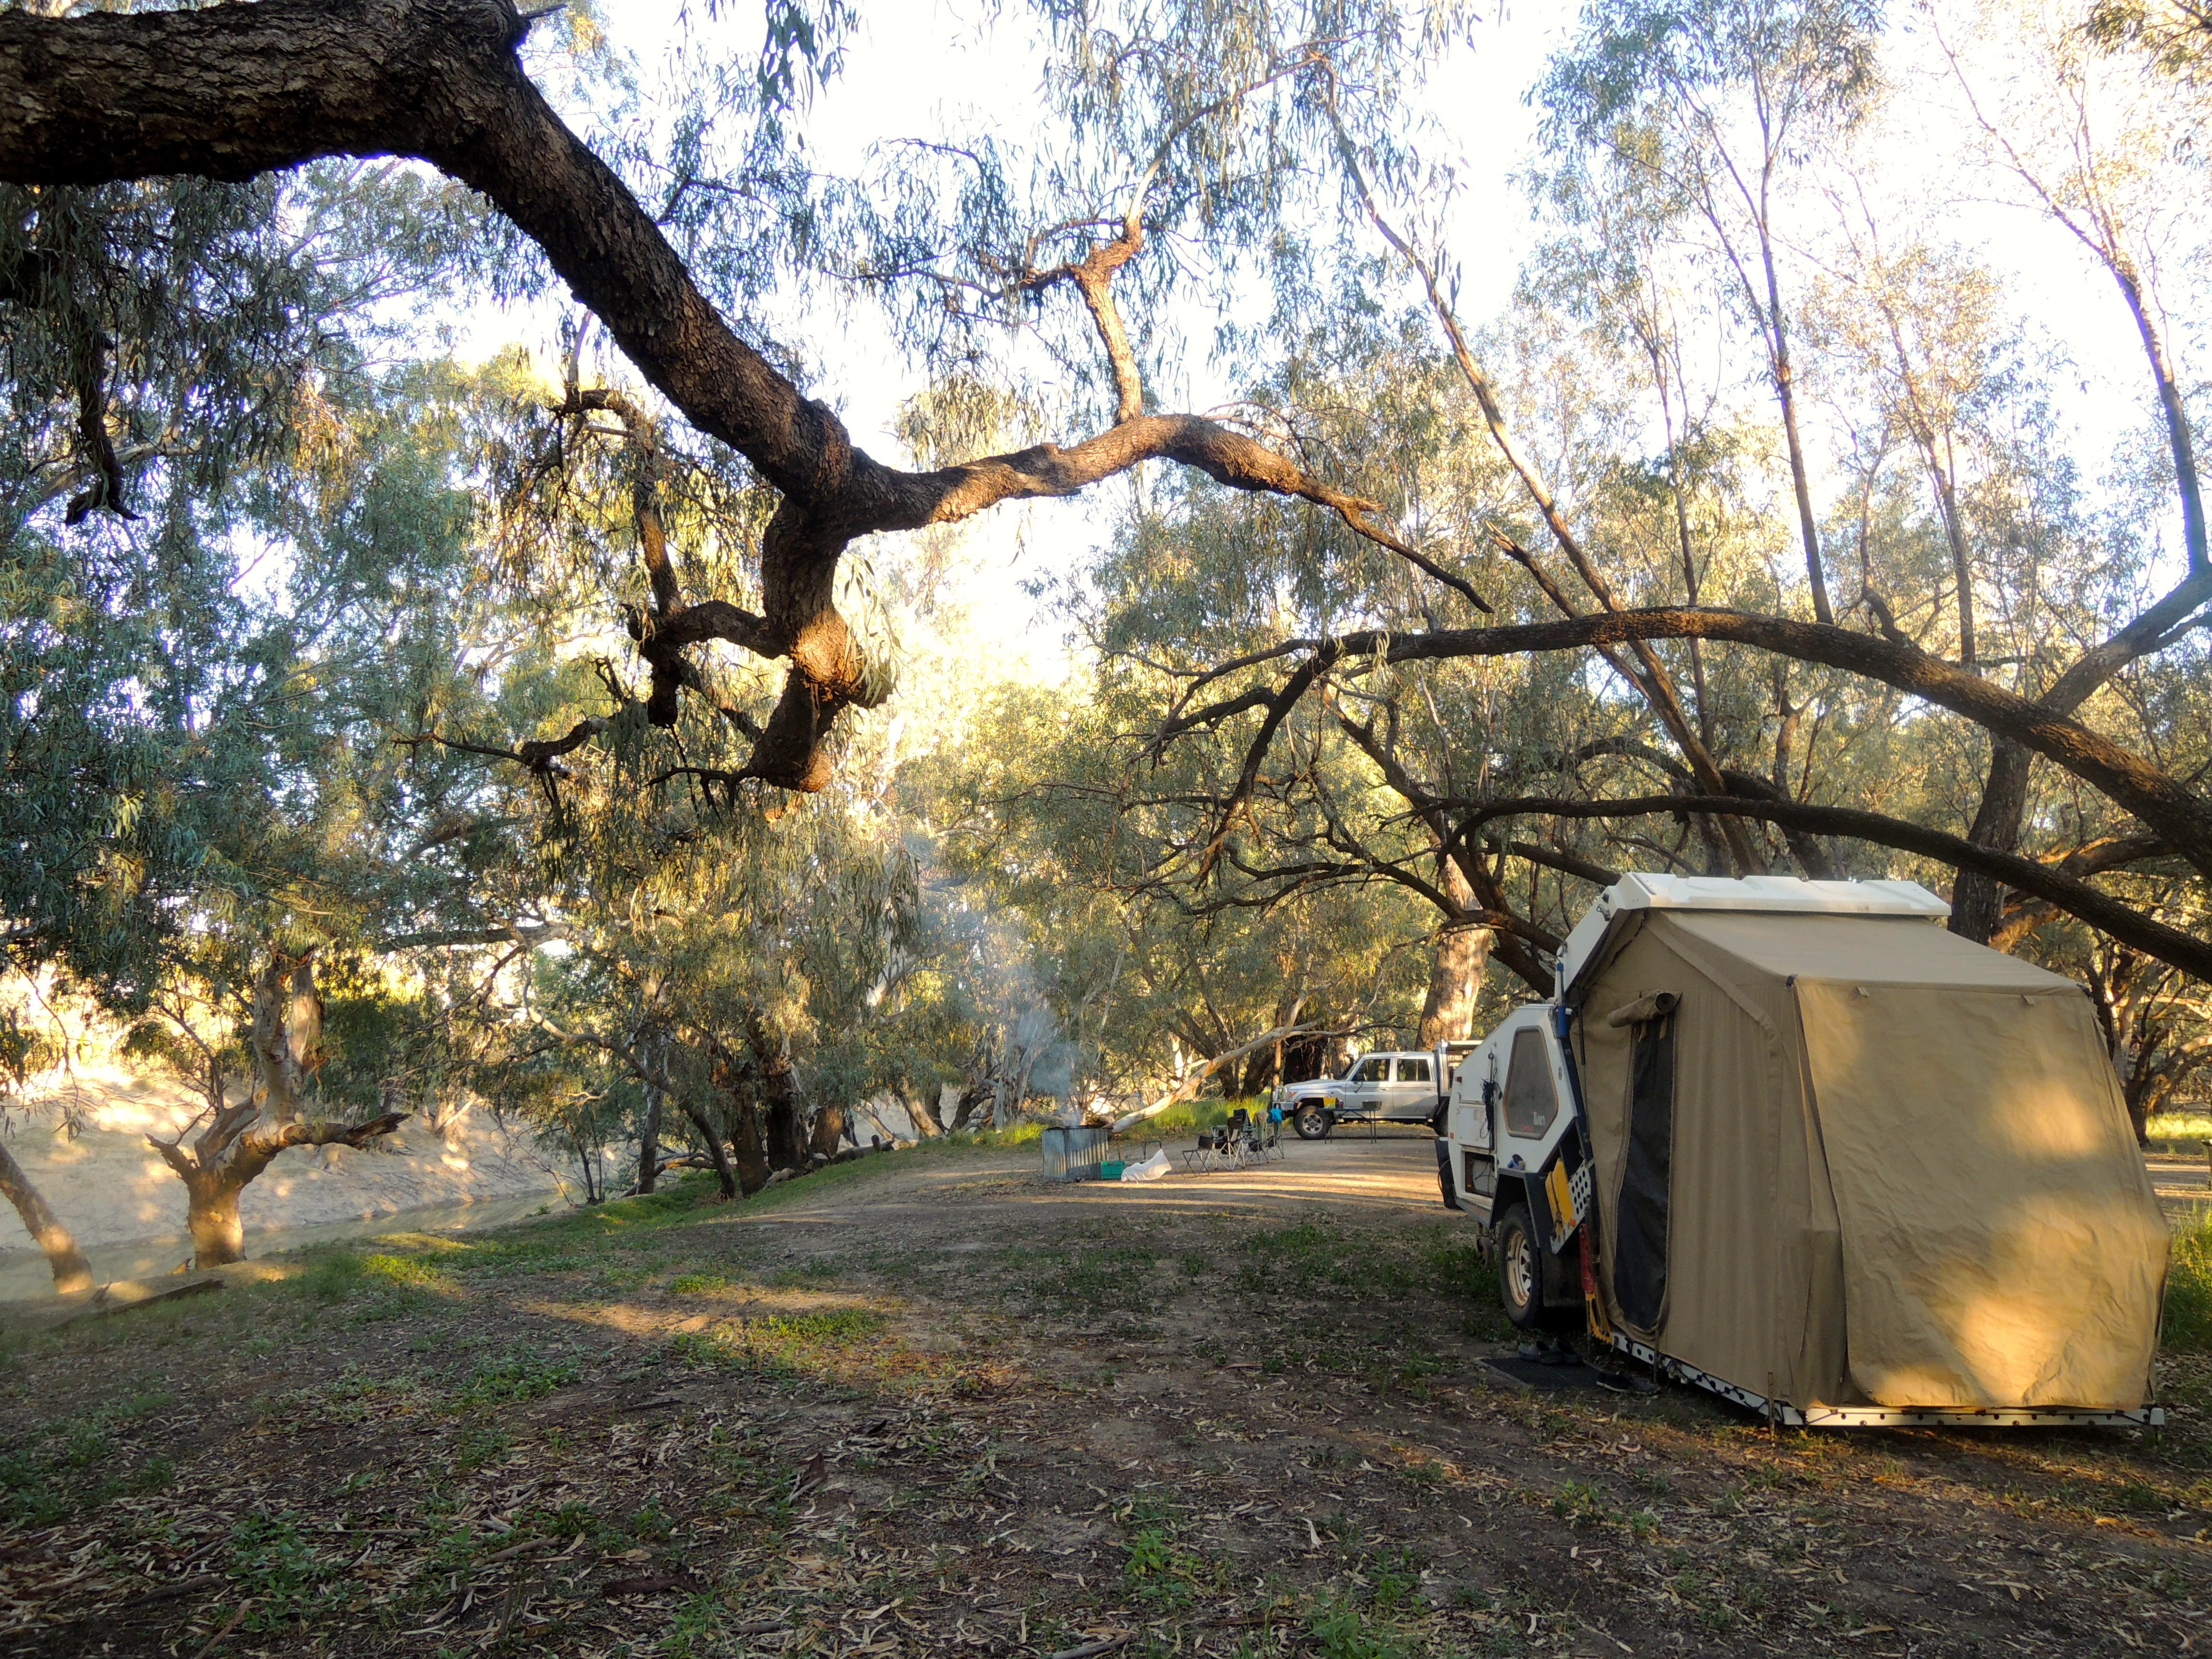 Darling River, Outback Australia